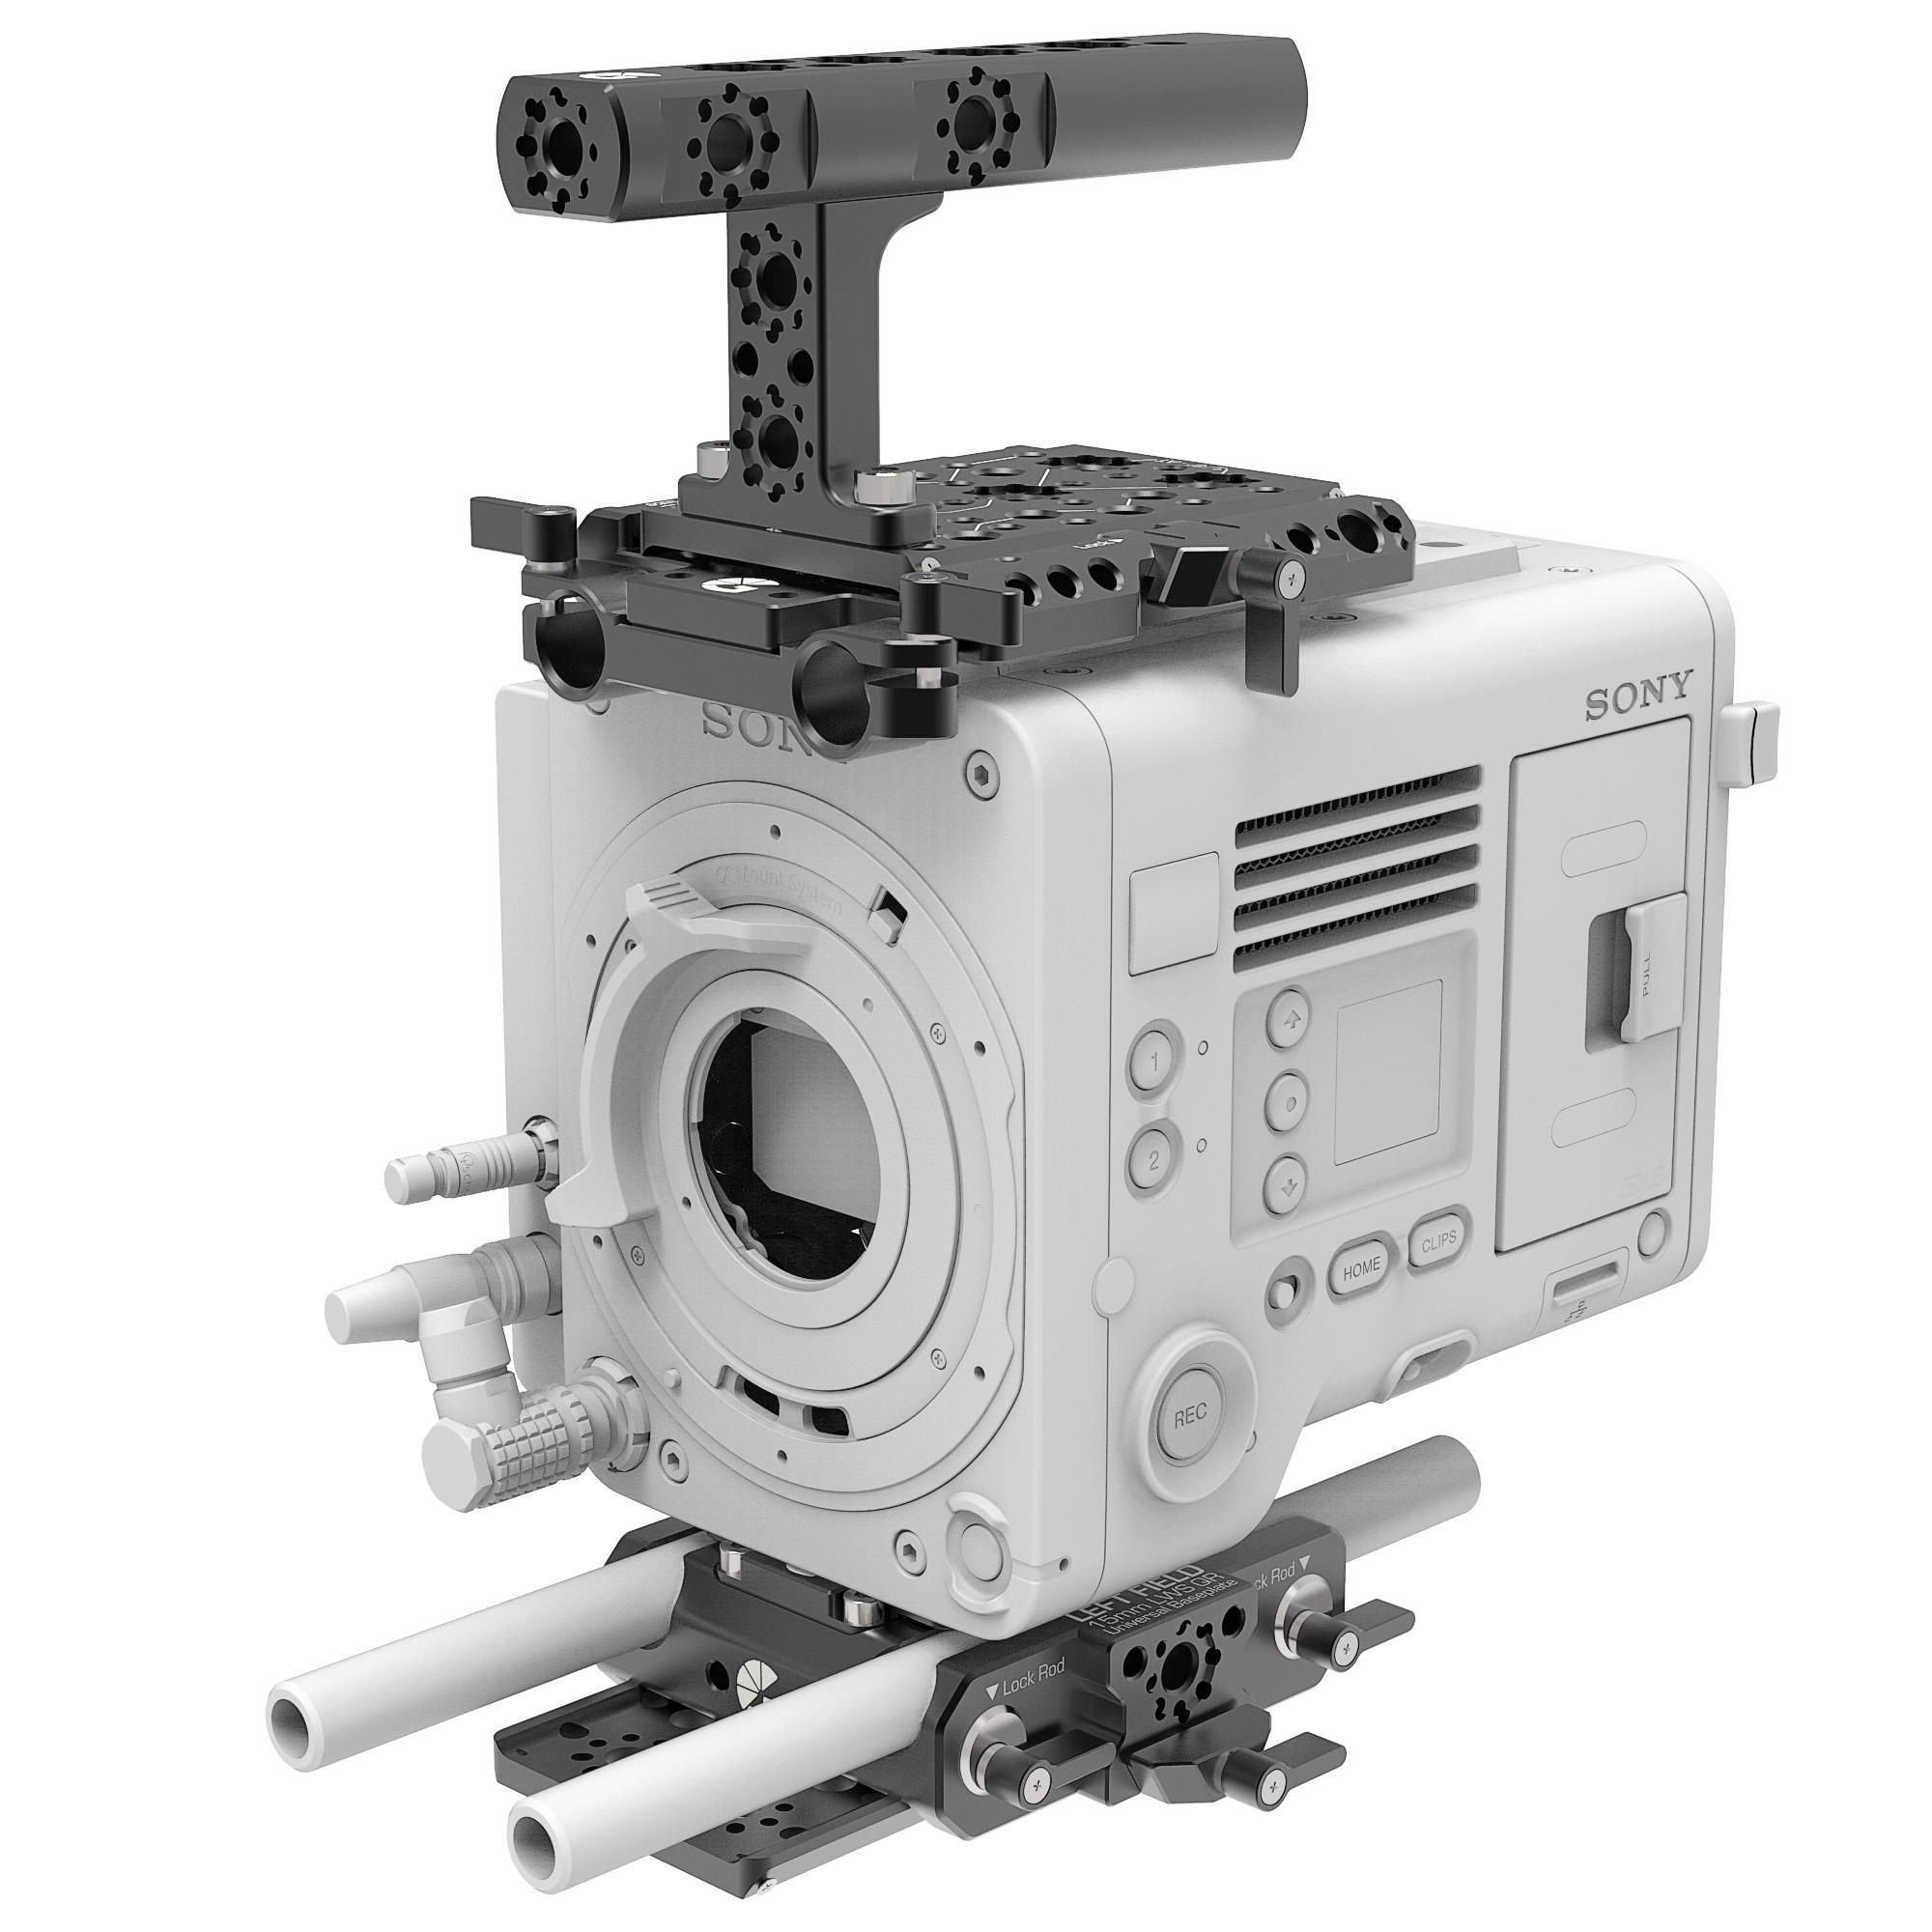 B4004 0003 Sony Venice Left Field Sliding Kit Ghost Render 1